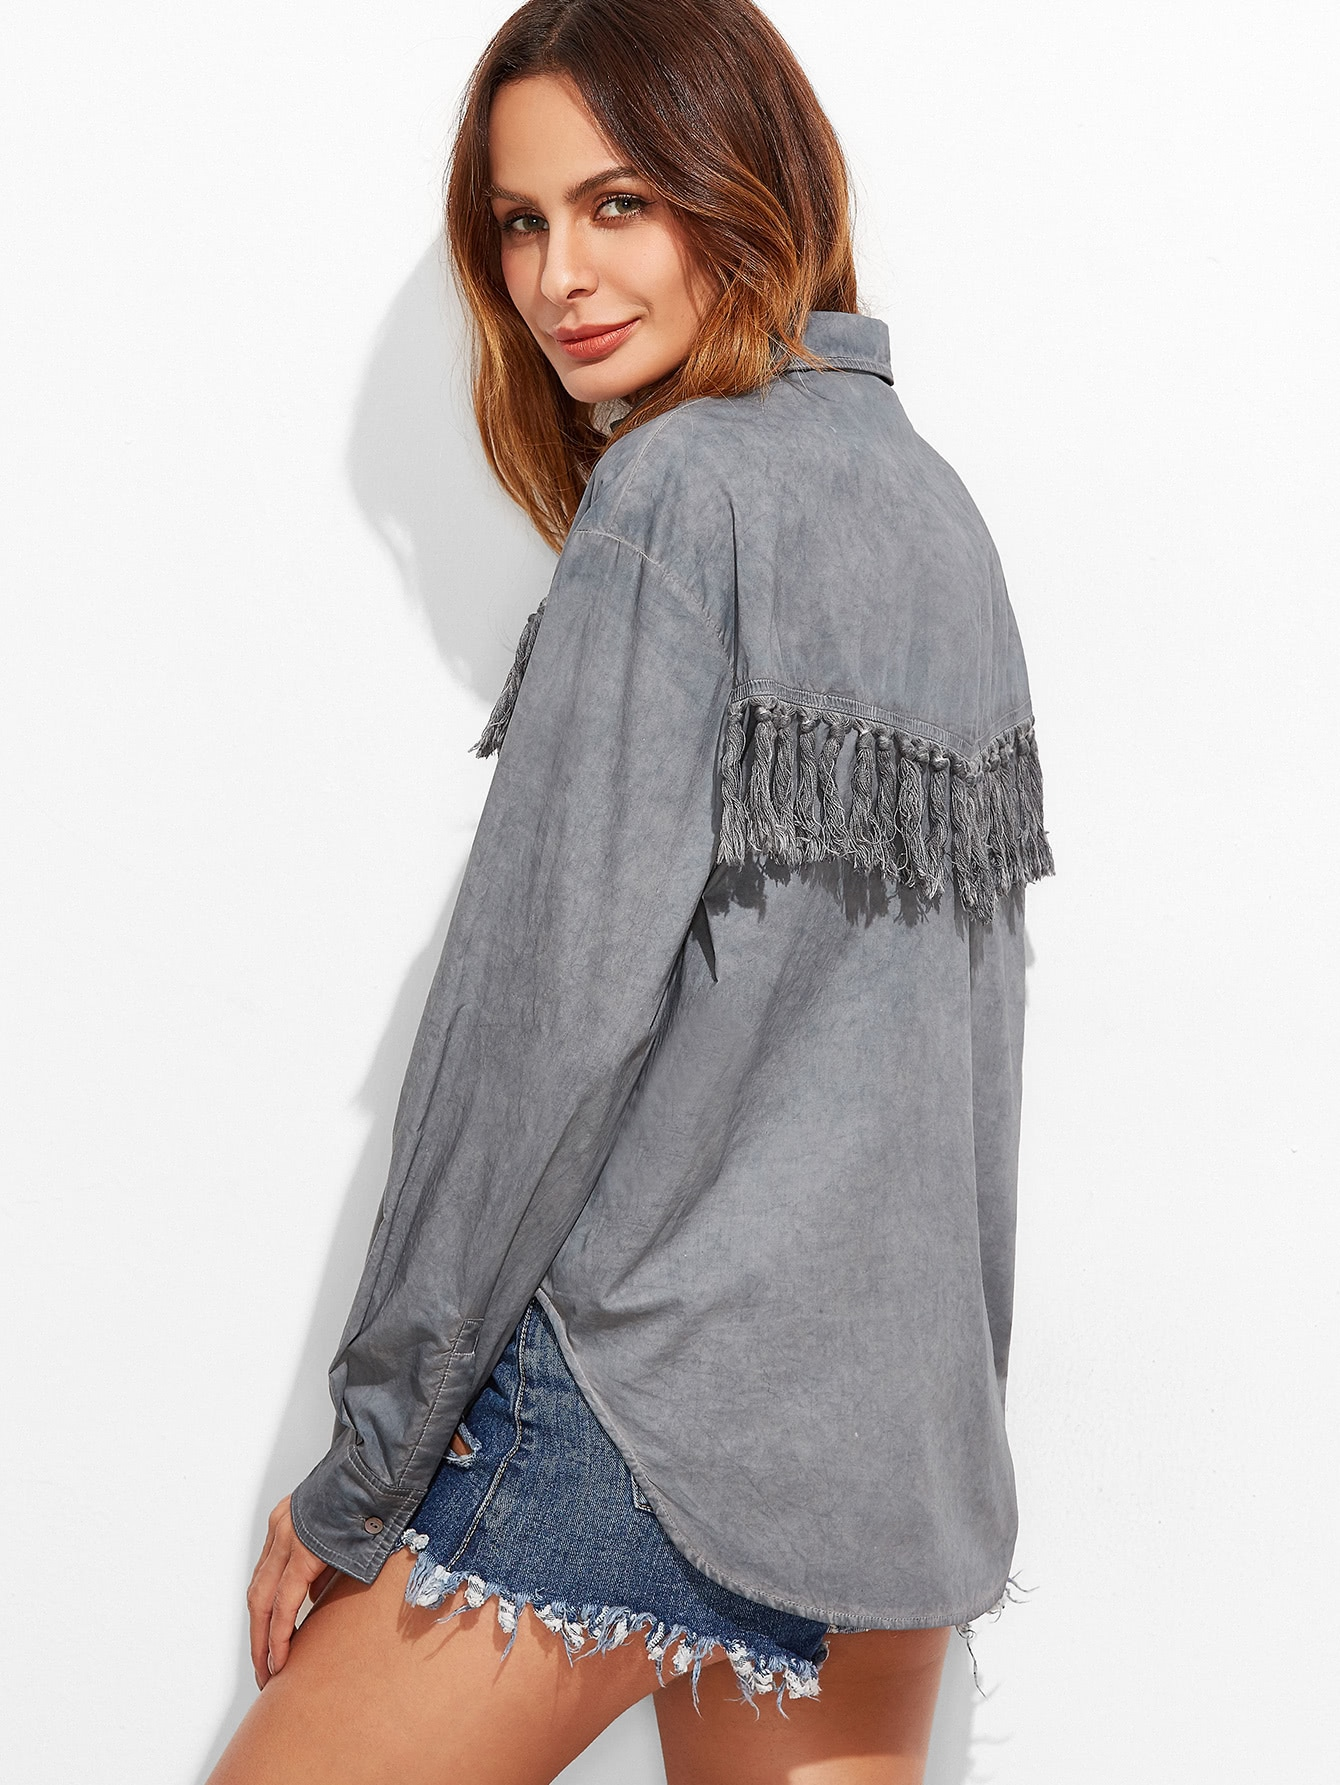 blouse161208706_2